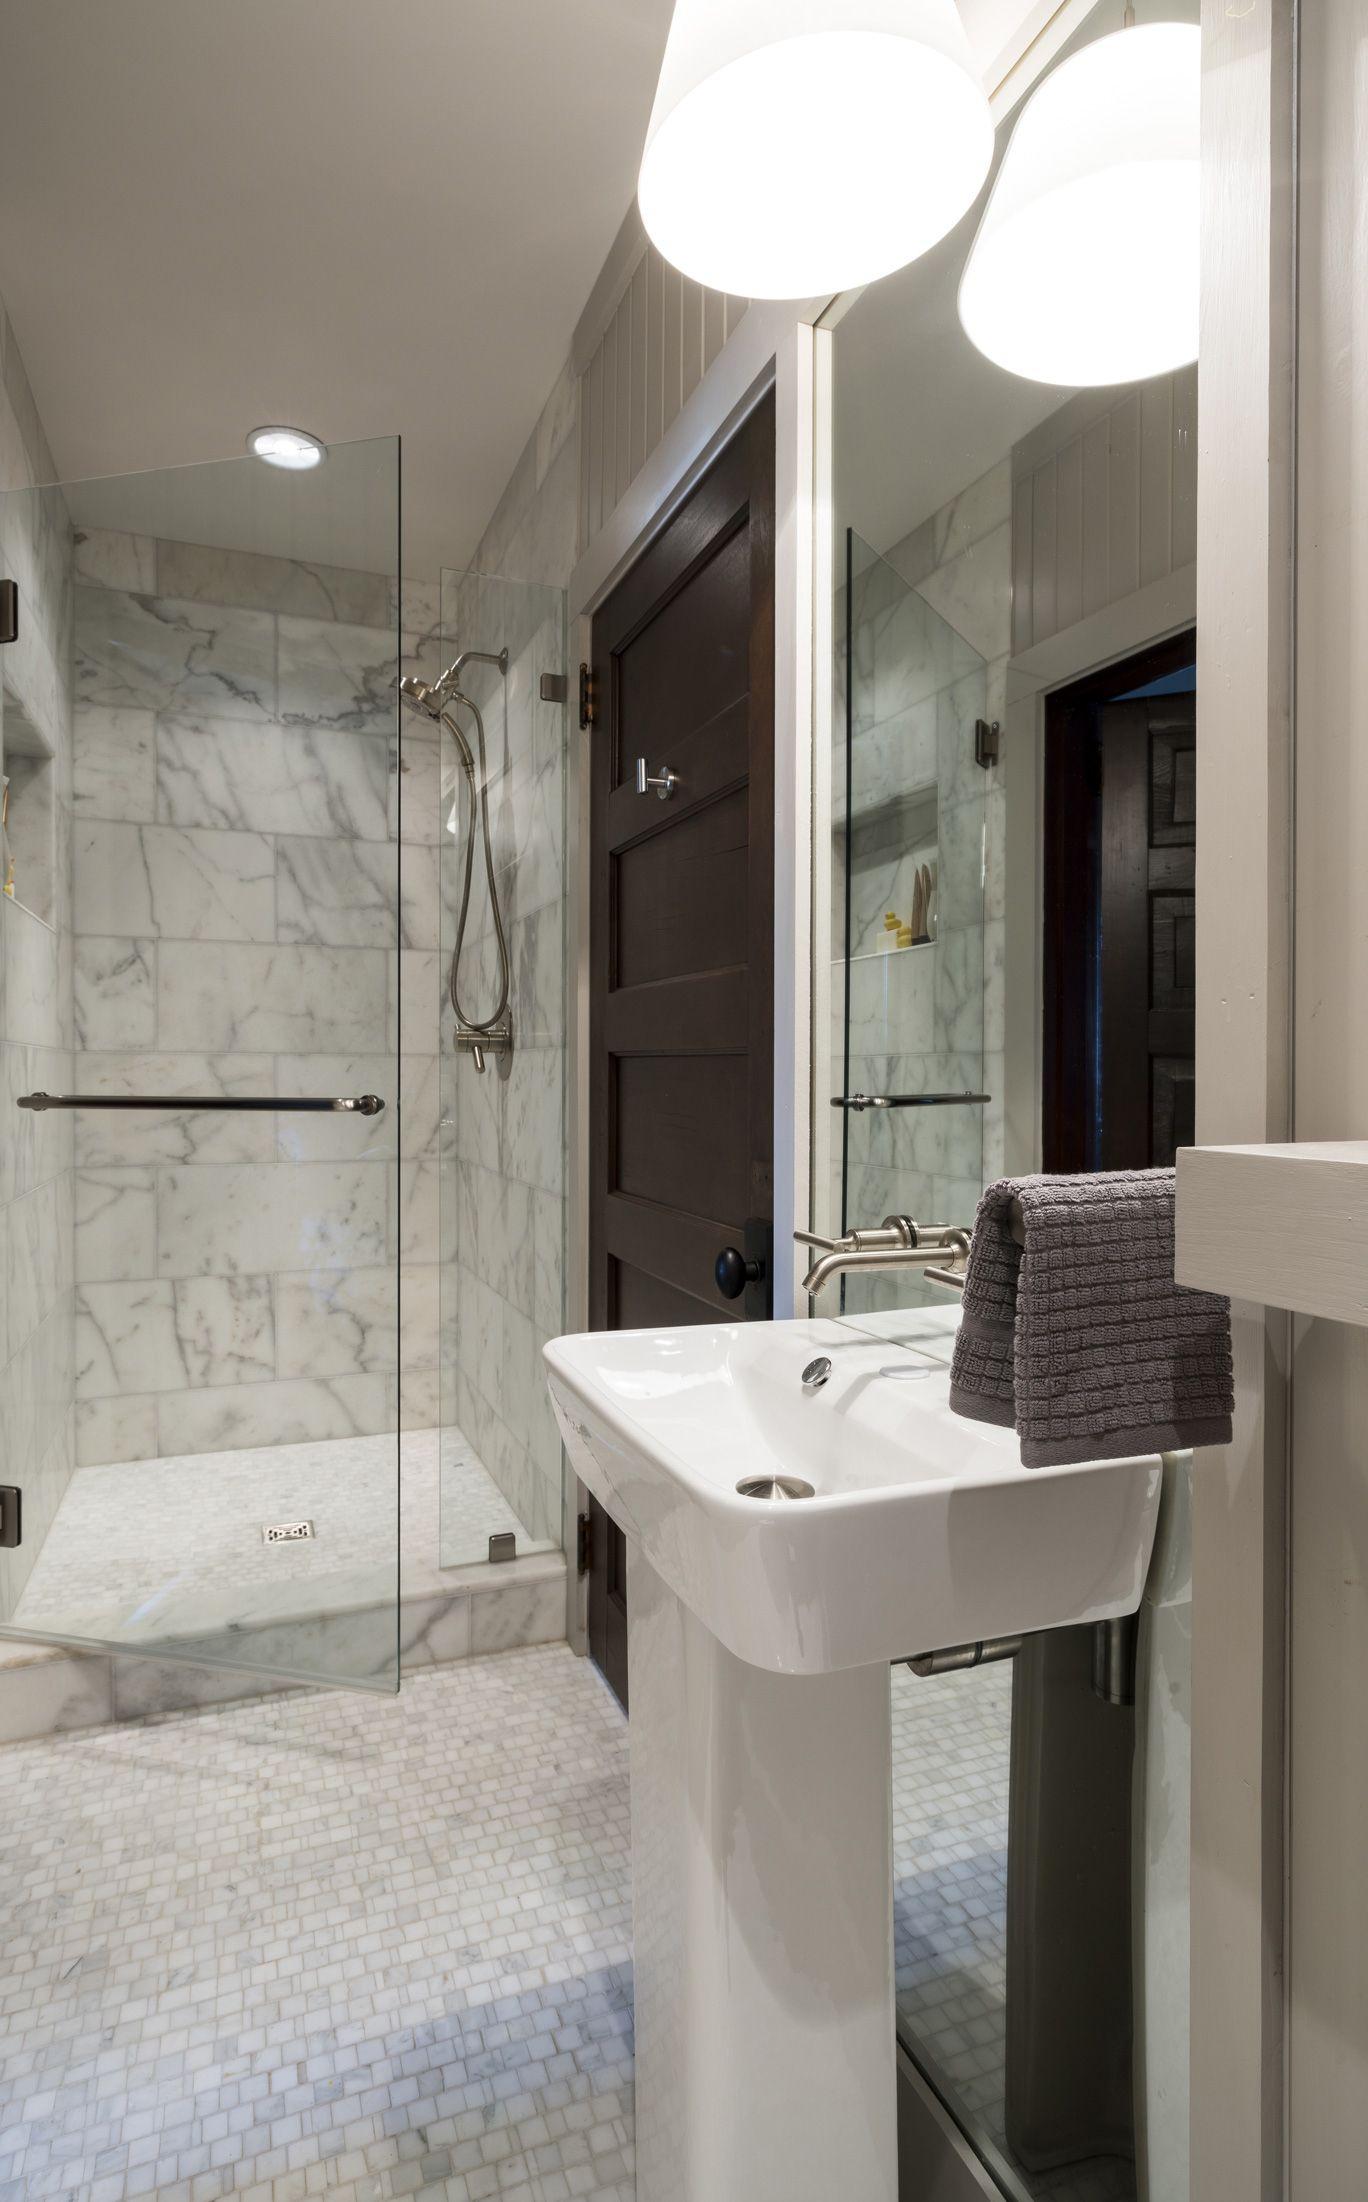 Bent Creek Renovation | Bathroom renovation small space ...